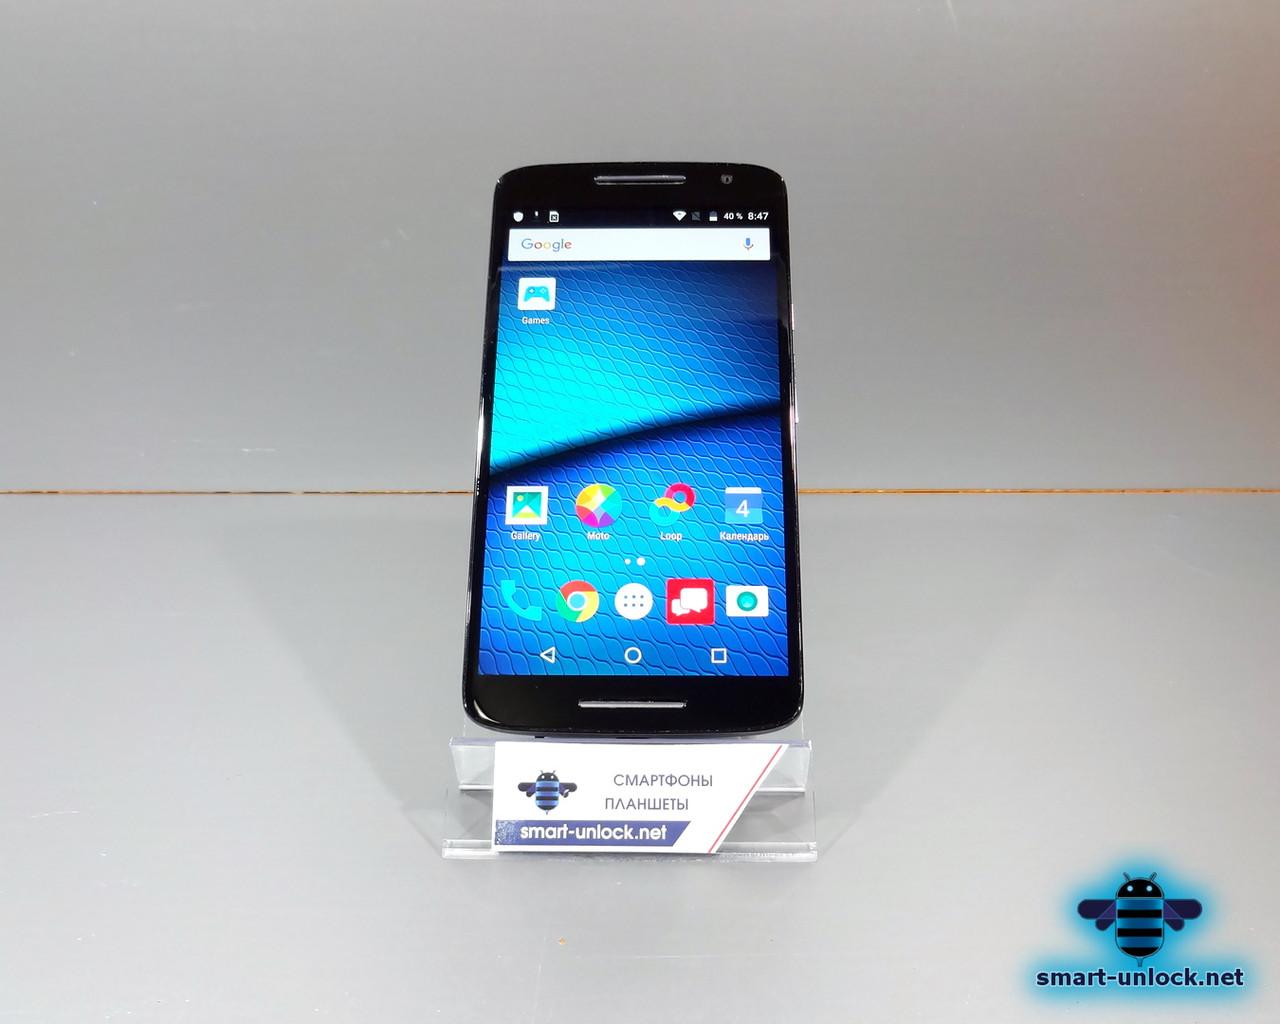 Телефон, смартфон Motorola Droid Maxx 2 Покупка без риска, гарантия!